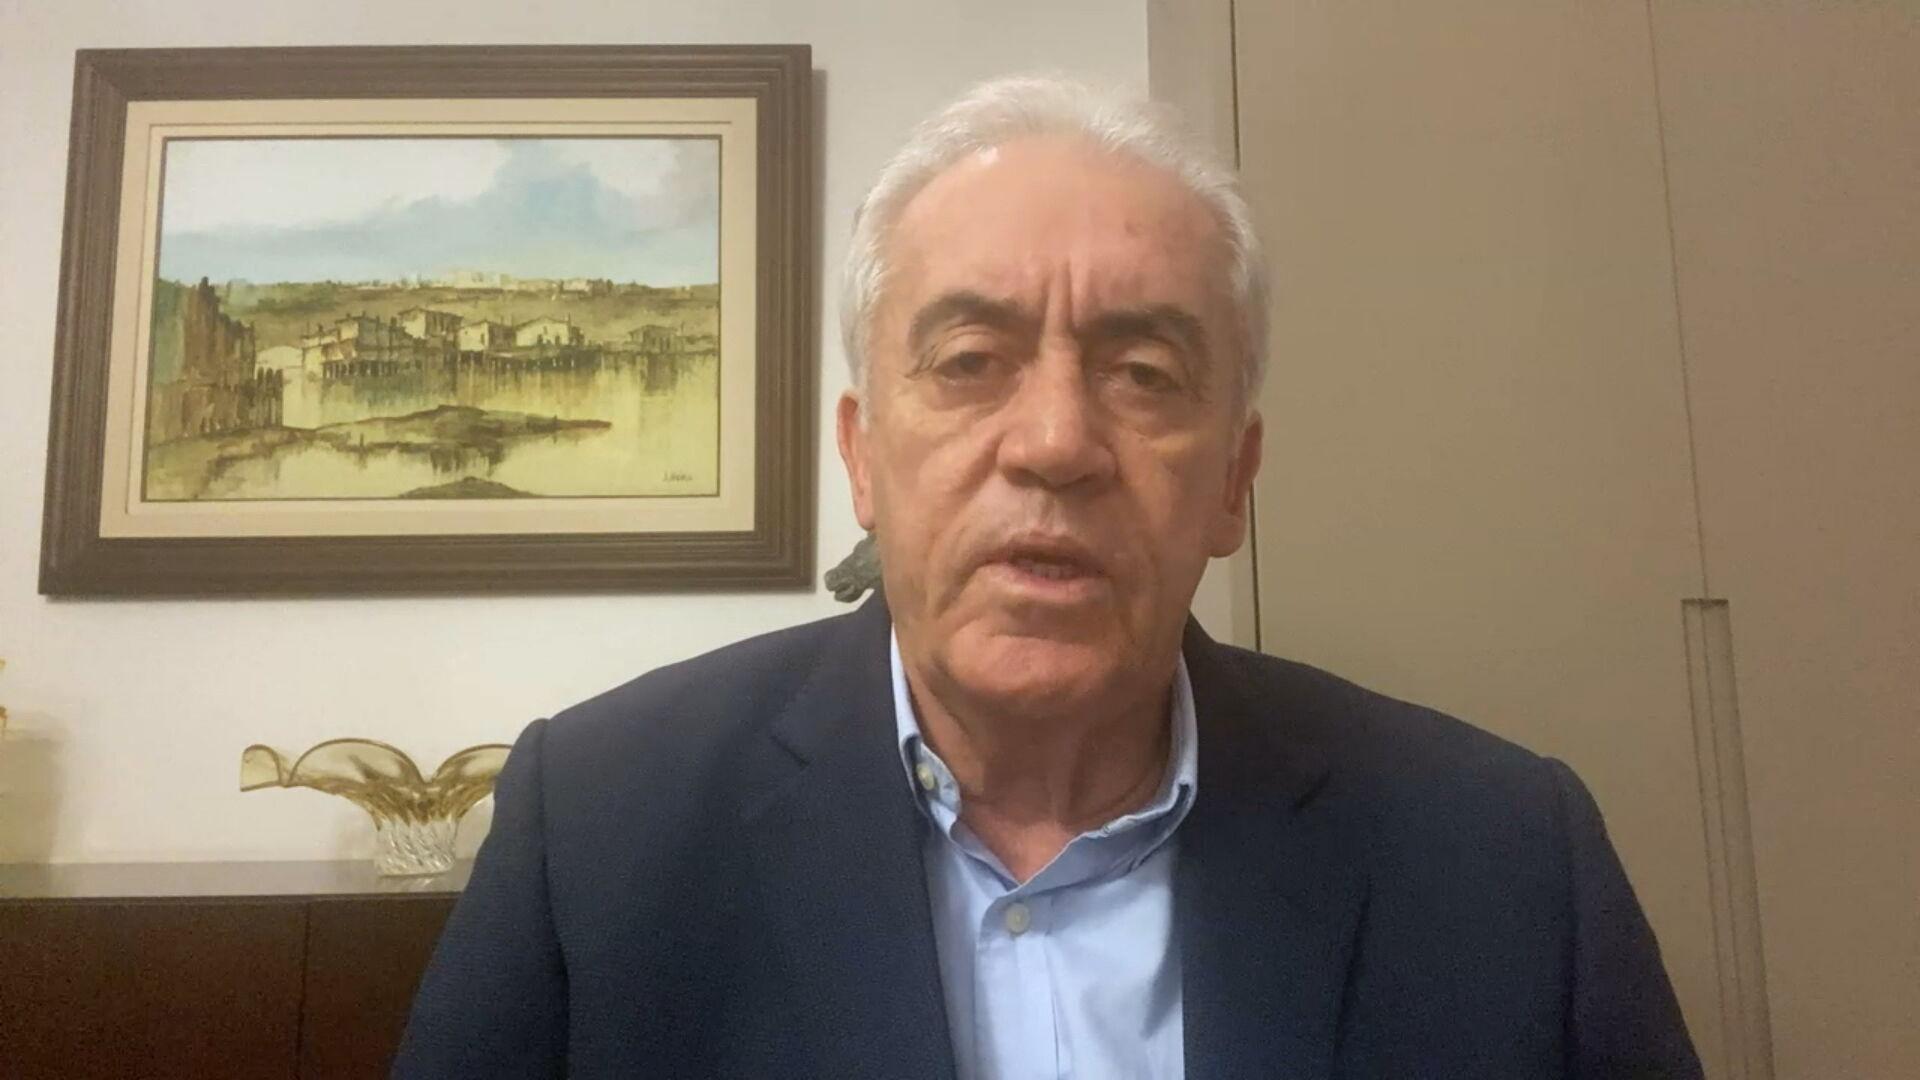 O senador Otto Alencar (PSD-BA) conversou com a CNN sobre a CPI da Pandemia